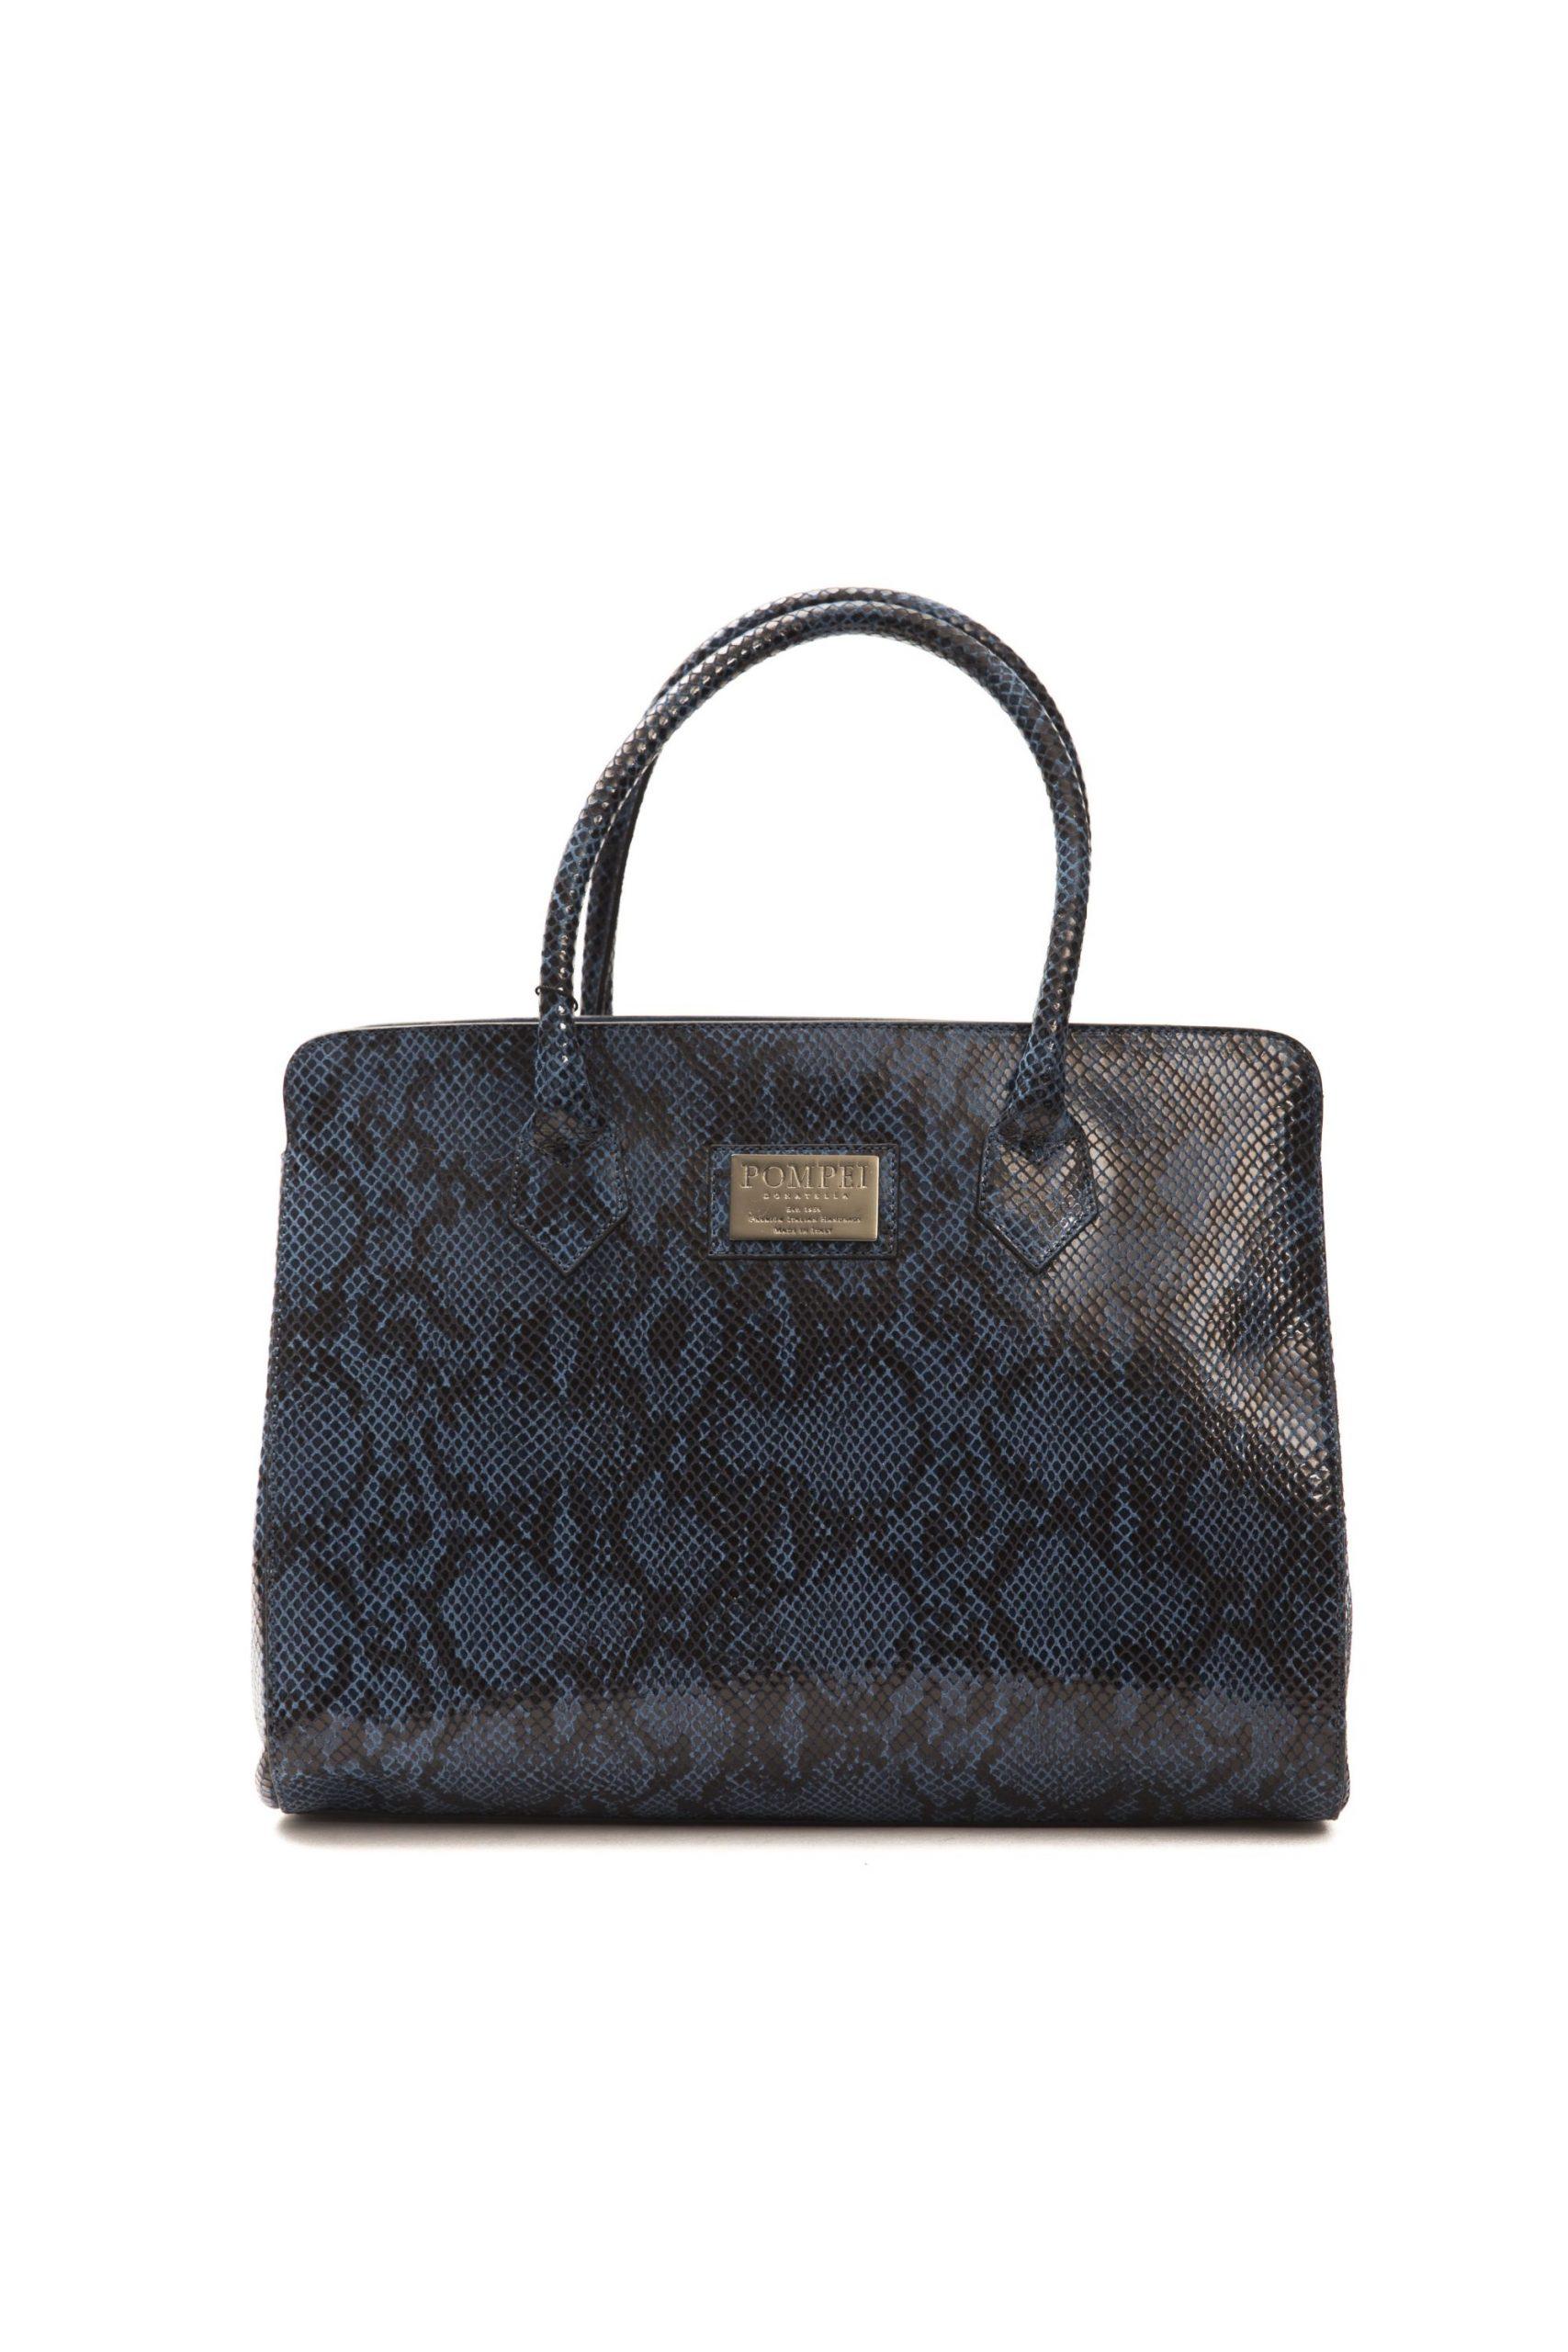 Pompei Donatella Women's Handbag Blue PO667818